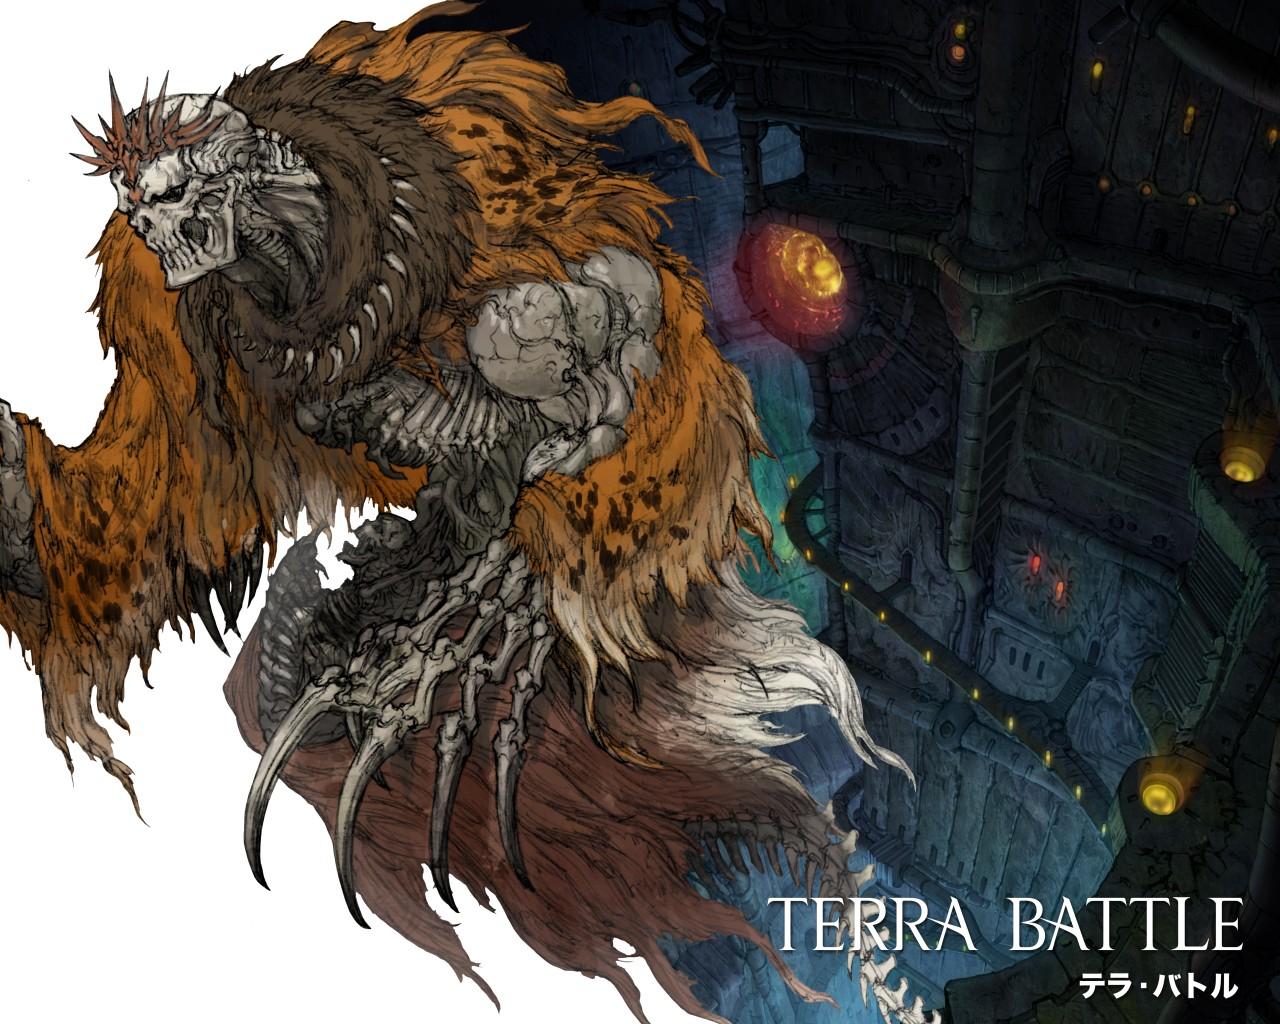 Terra-Battle_2014_08-27-14_023